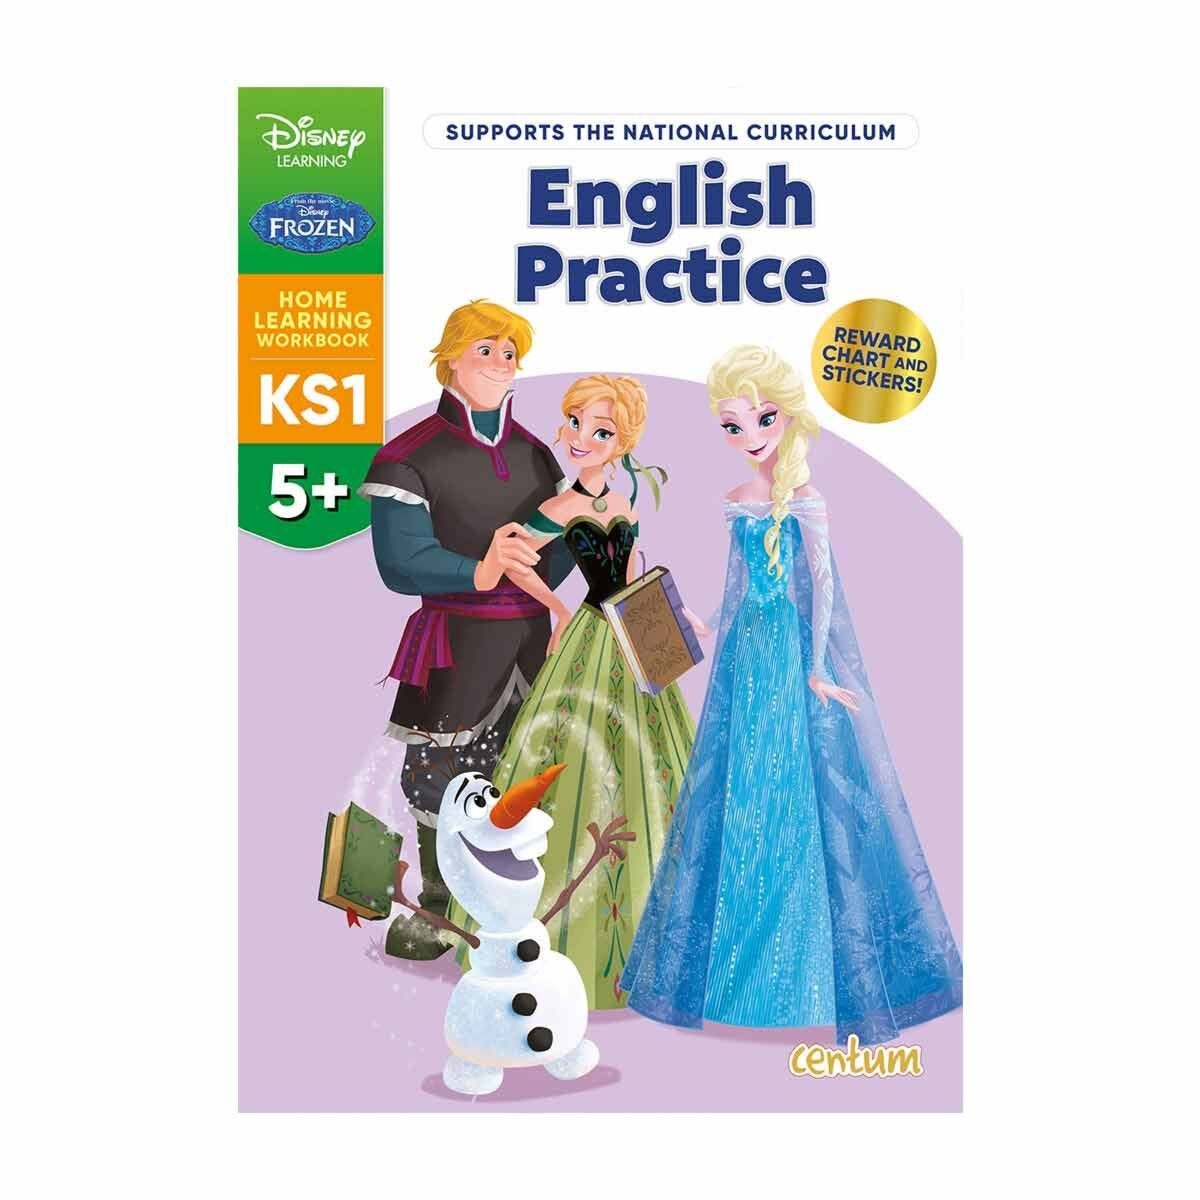 Centum Disney Learning Frozen English Practice 5